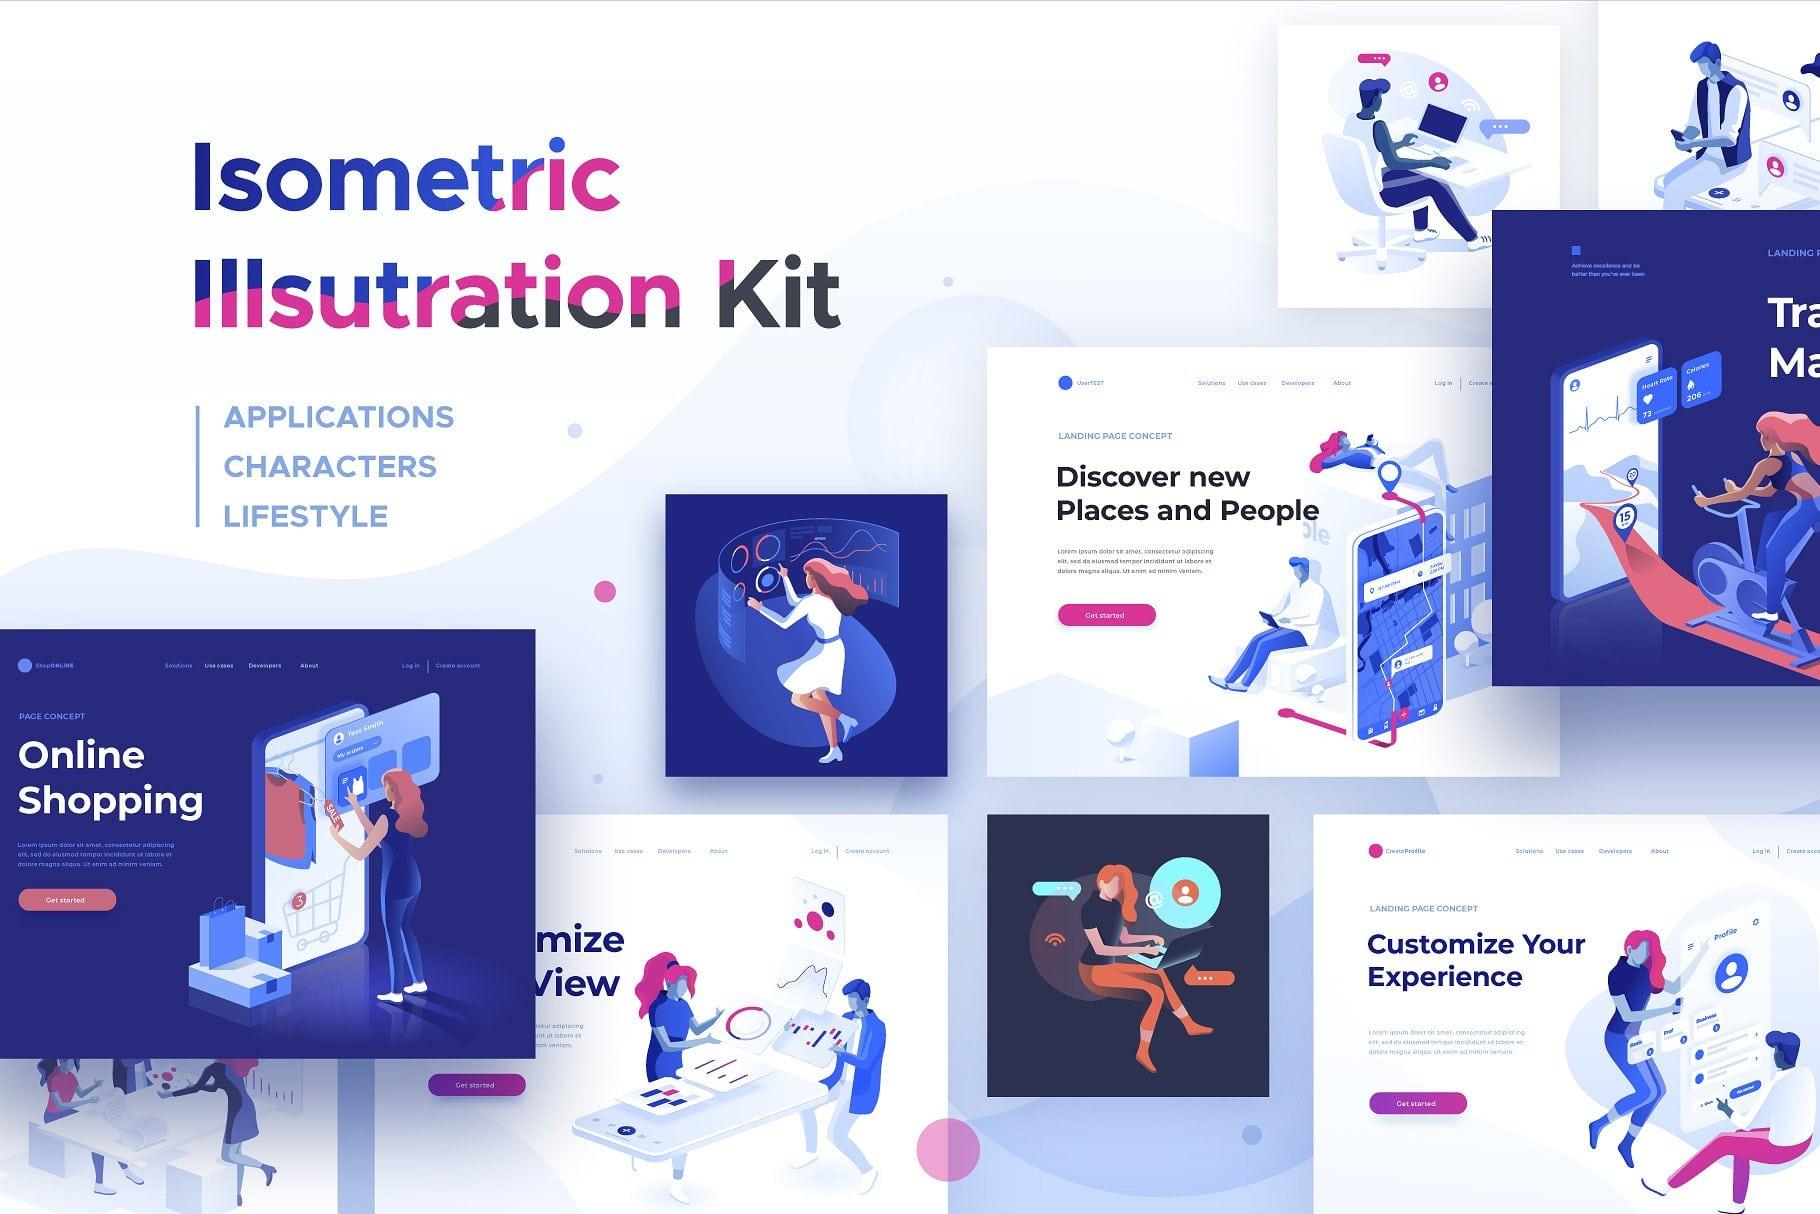 10 Premium Vector Graphics from CreativeMarket.com - Feb 2019 4